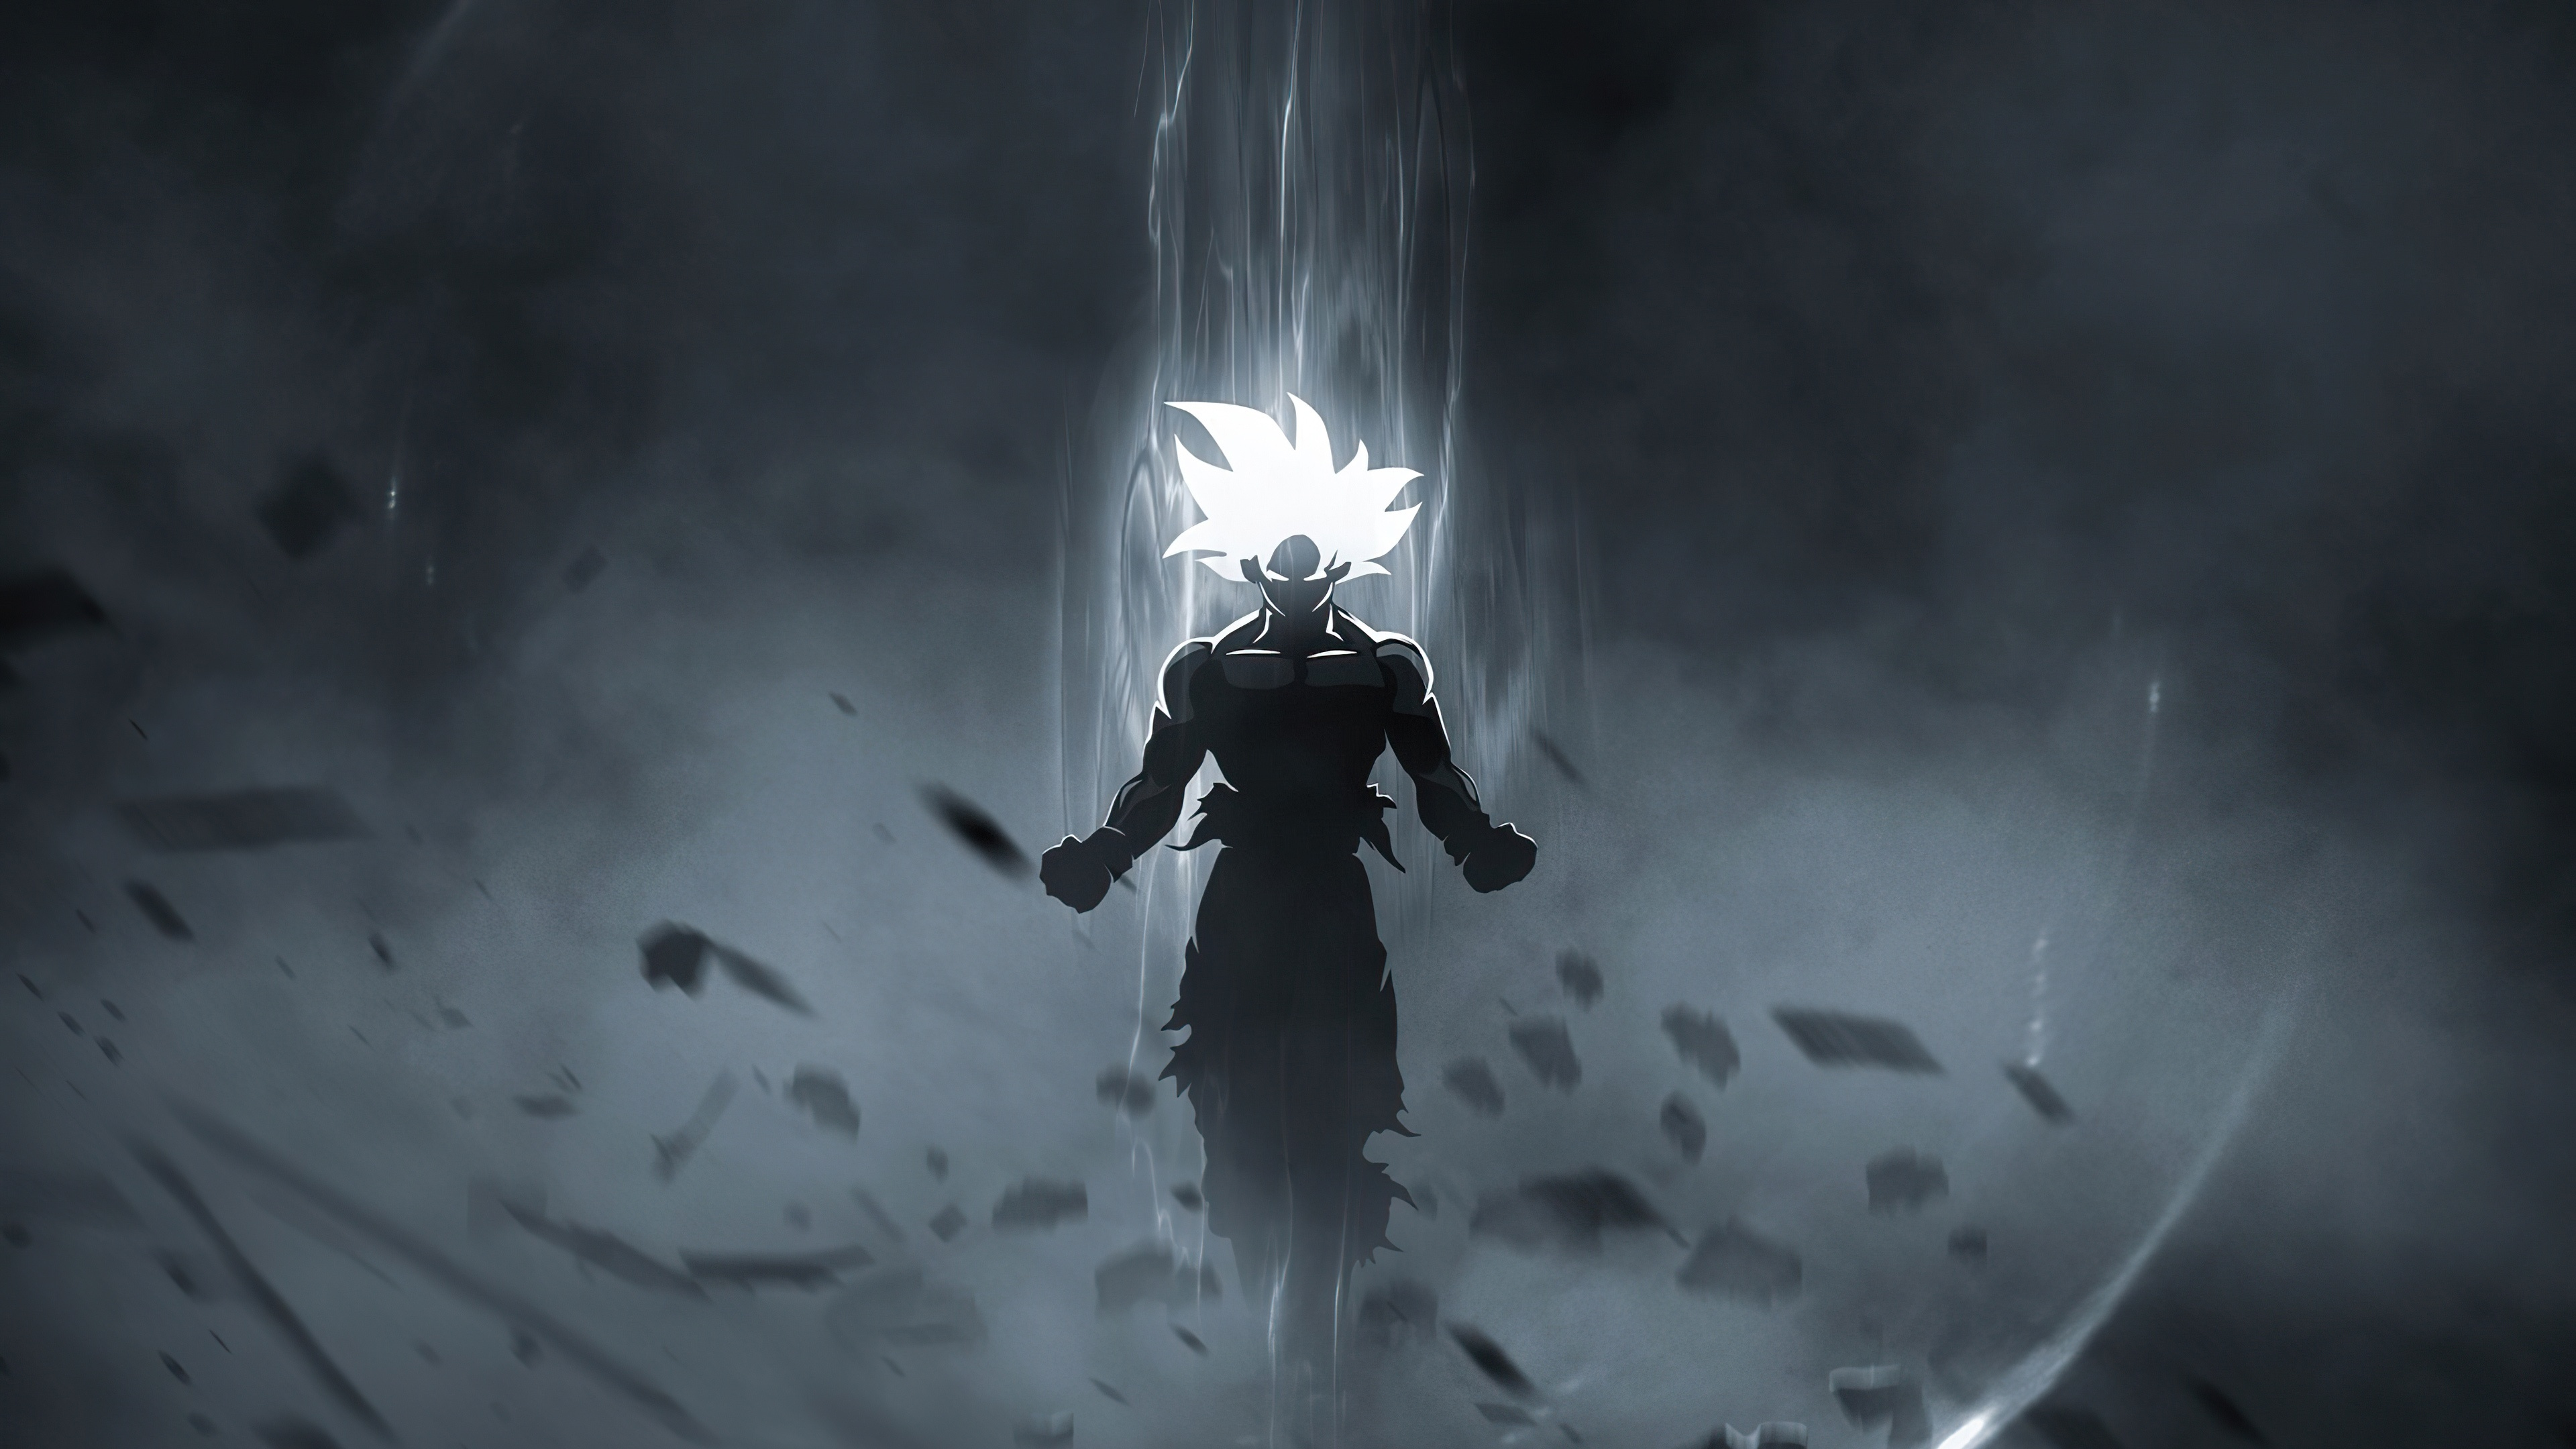 Goku free image